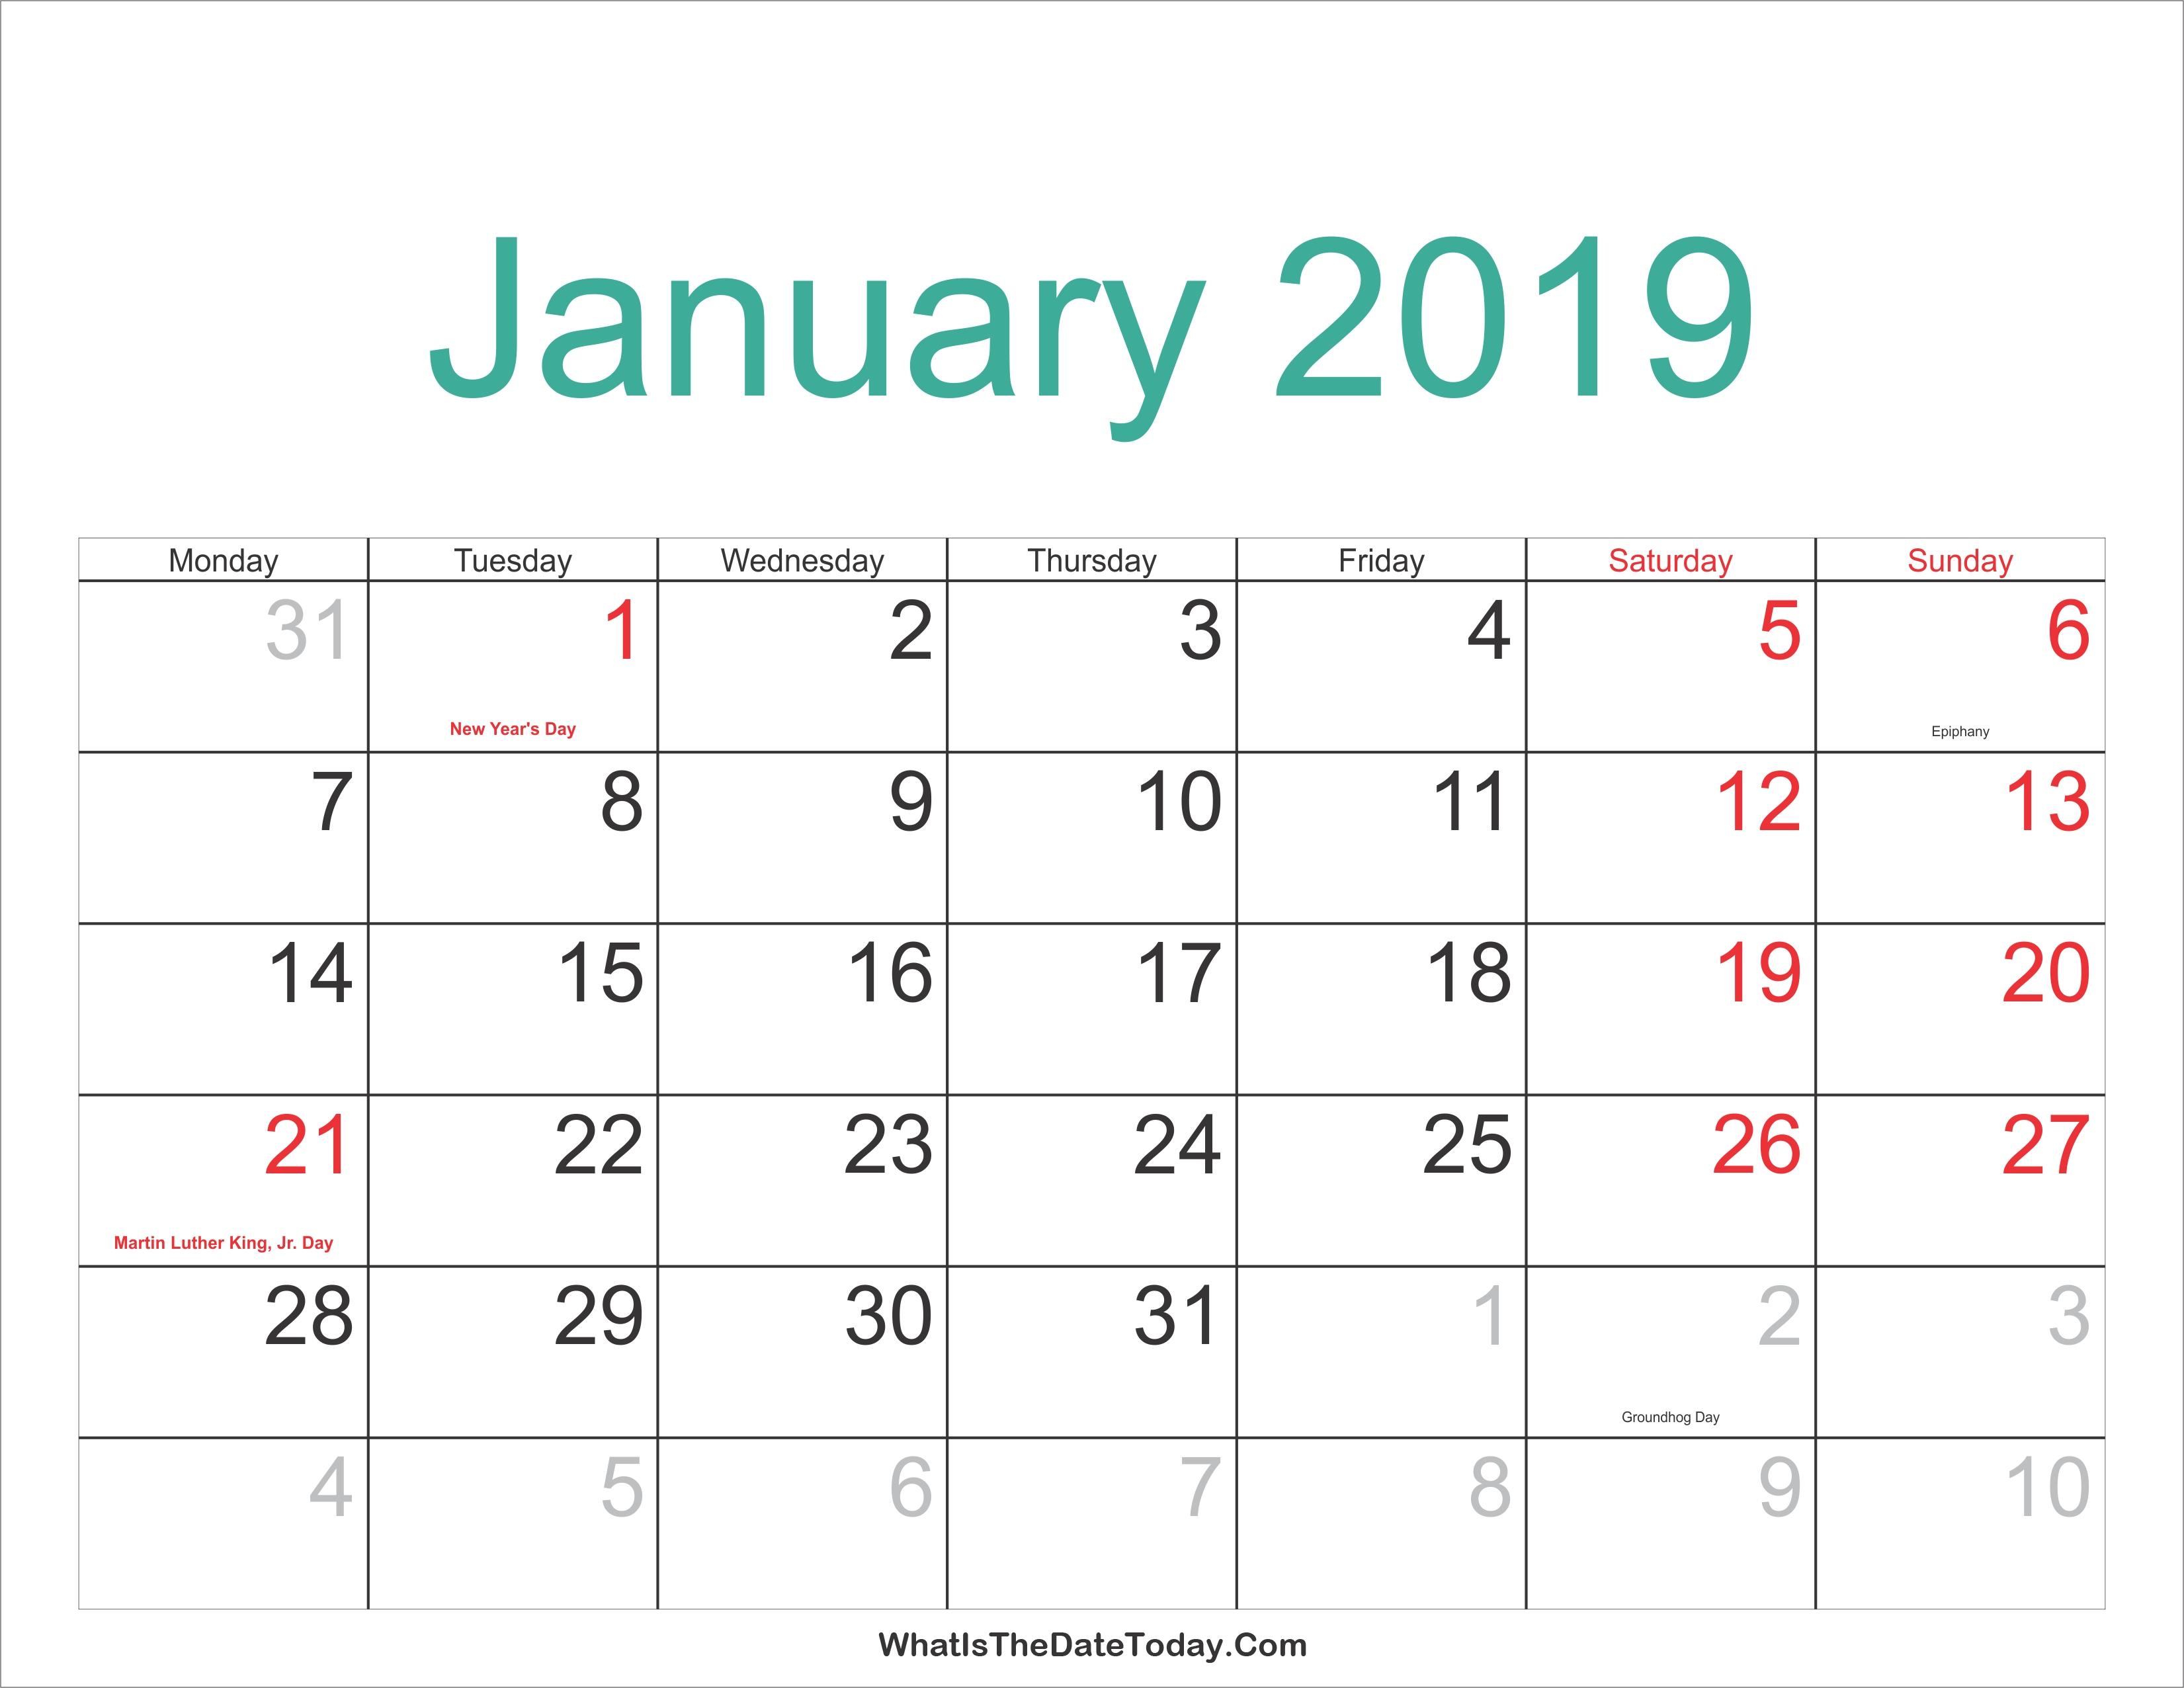 January 2019 Calendar Holidays January 8 2019 Calendar